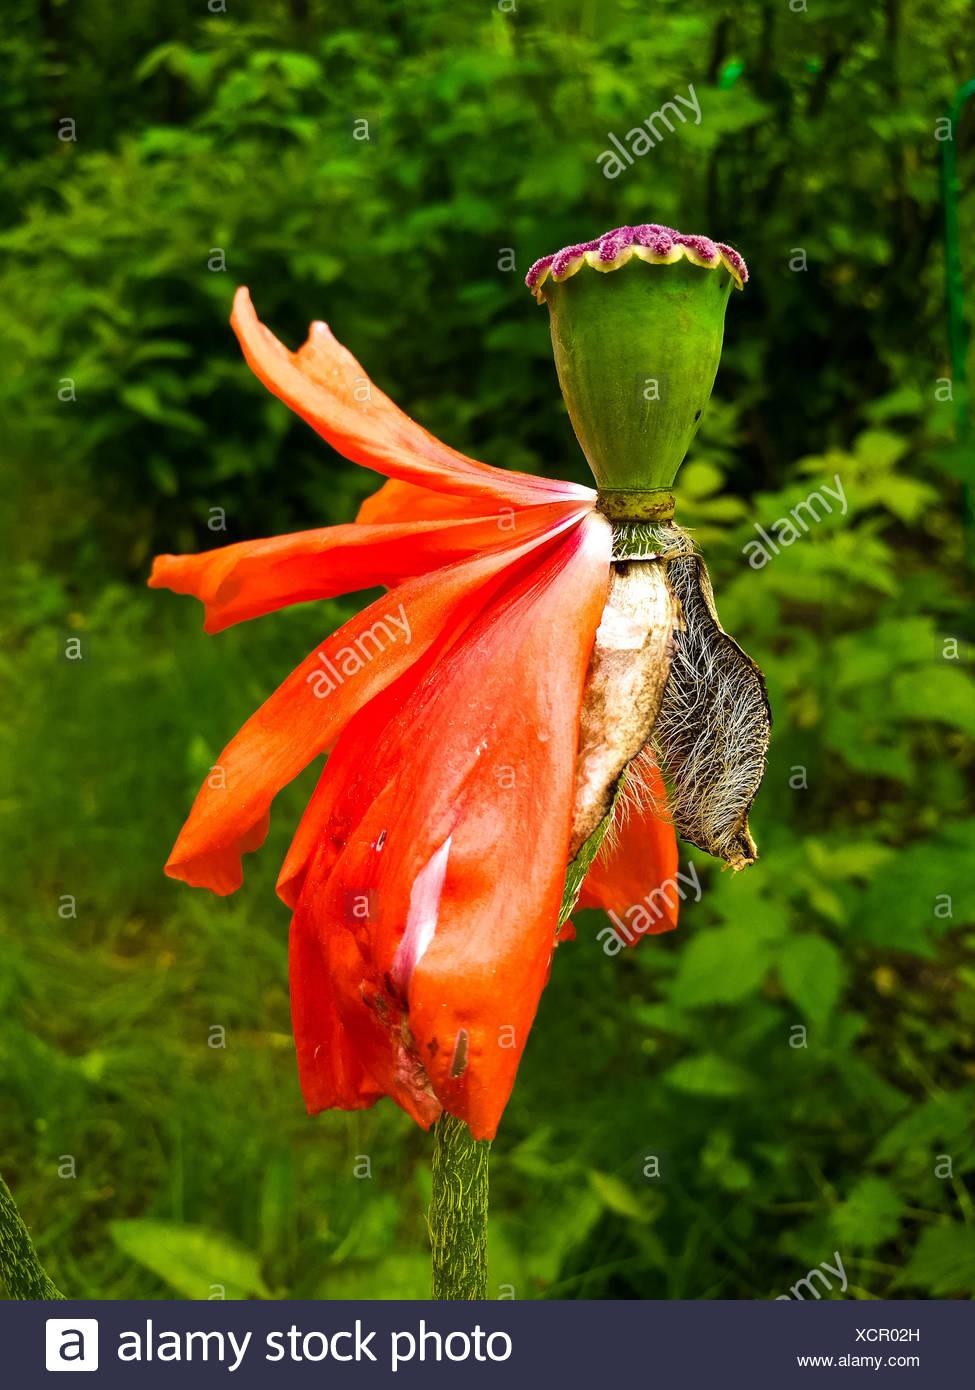 Orange Flower with Falling Petals - Stock Image